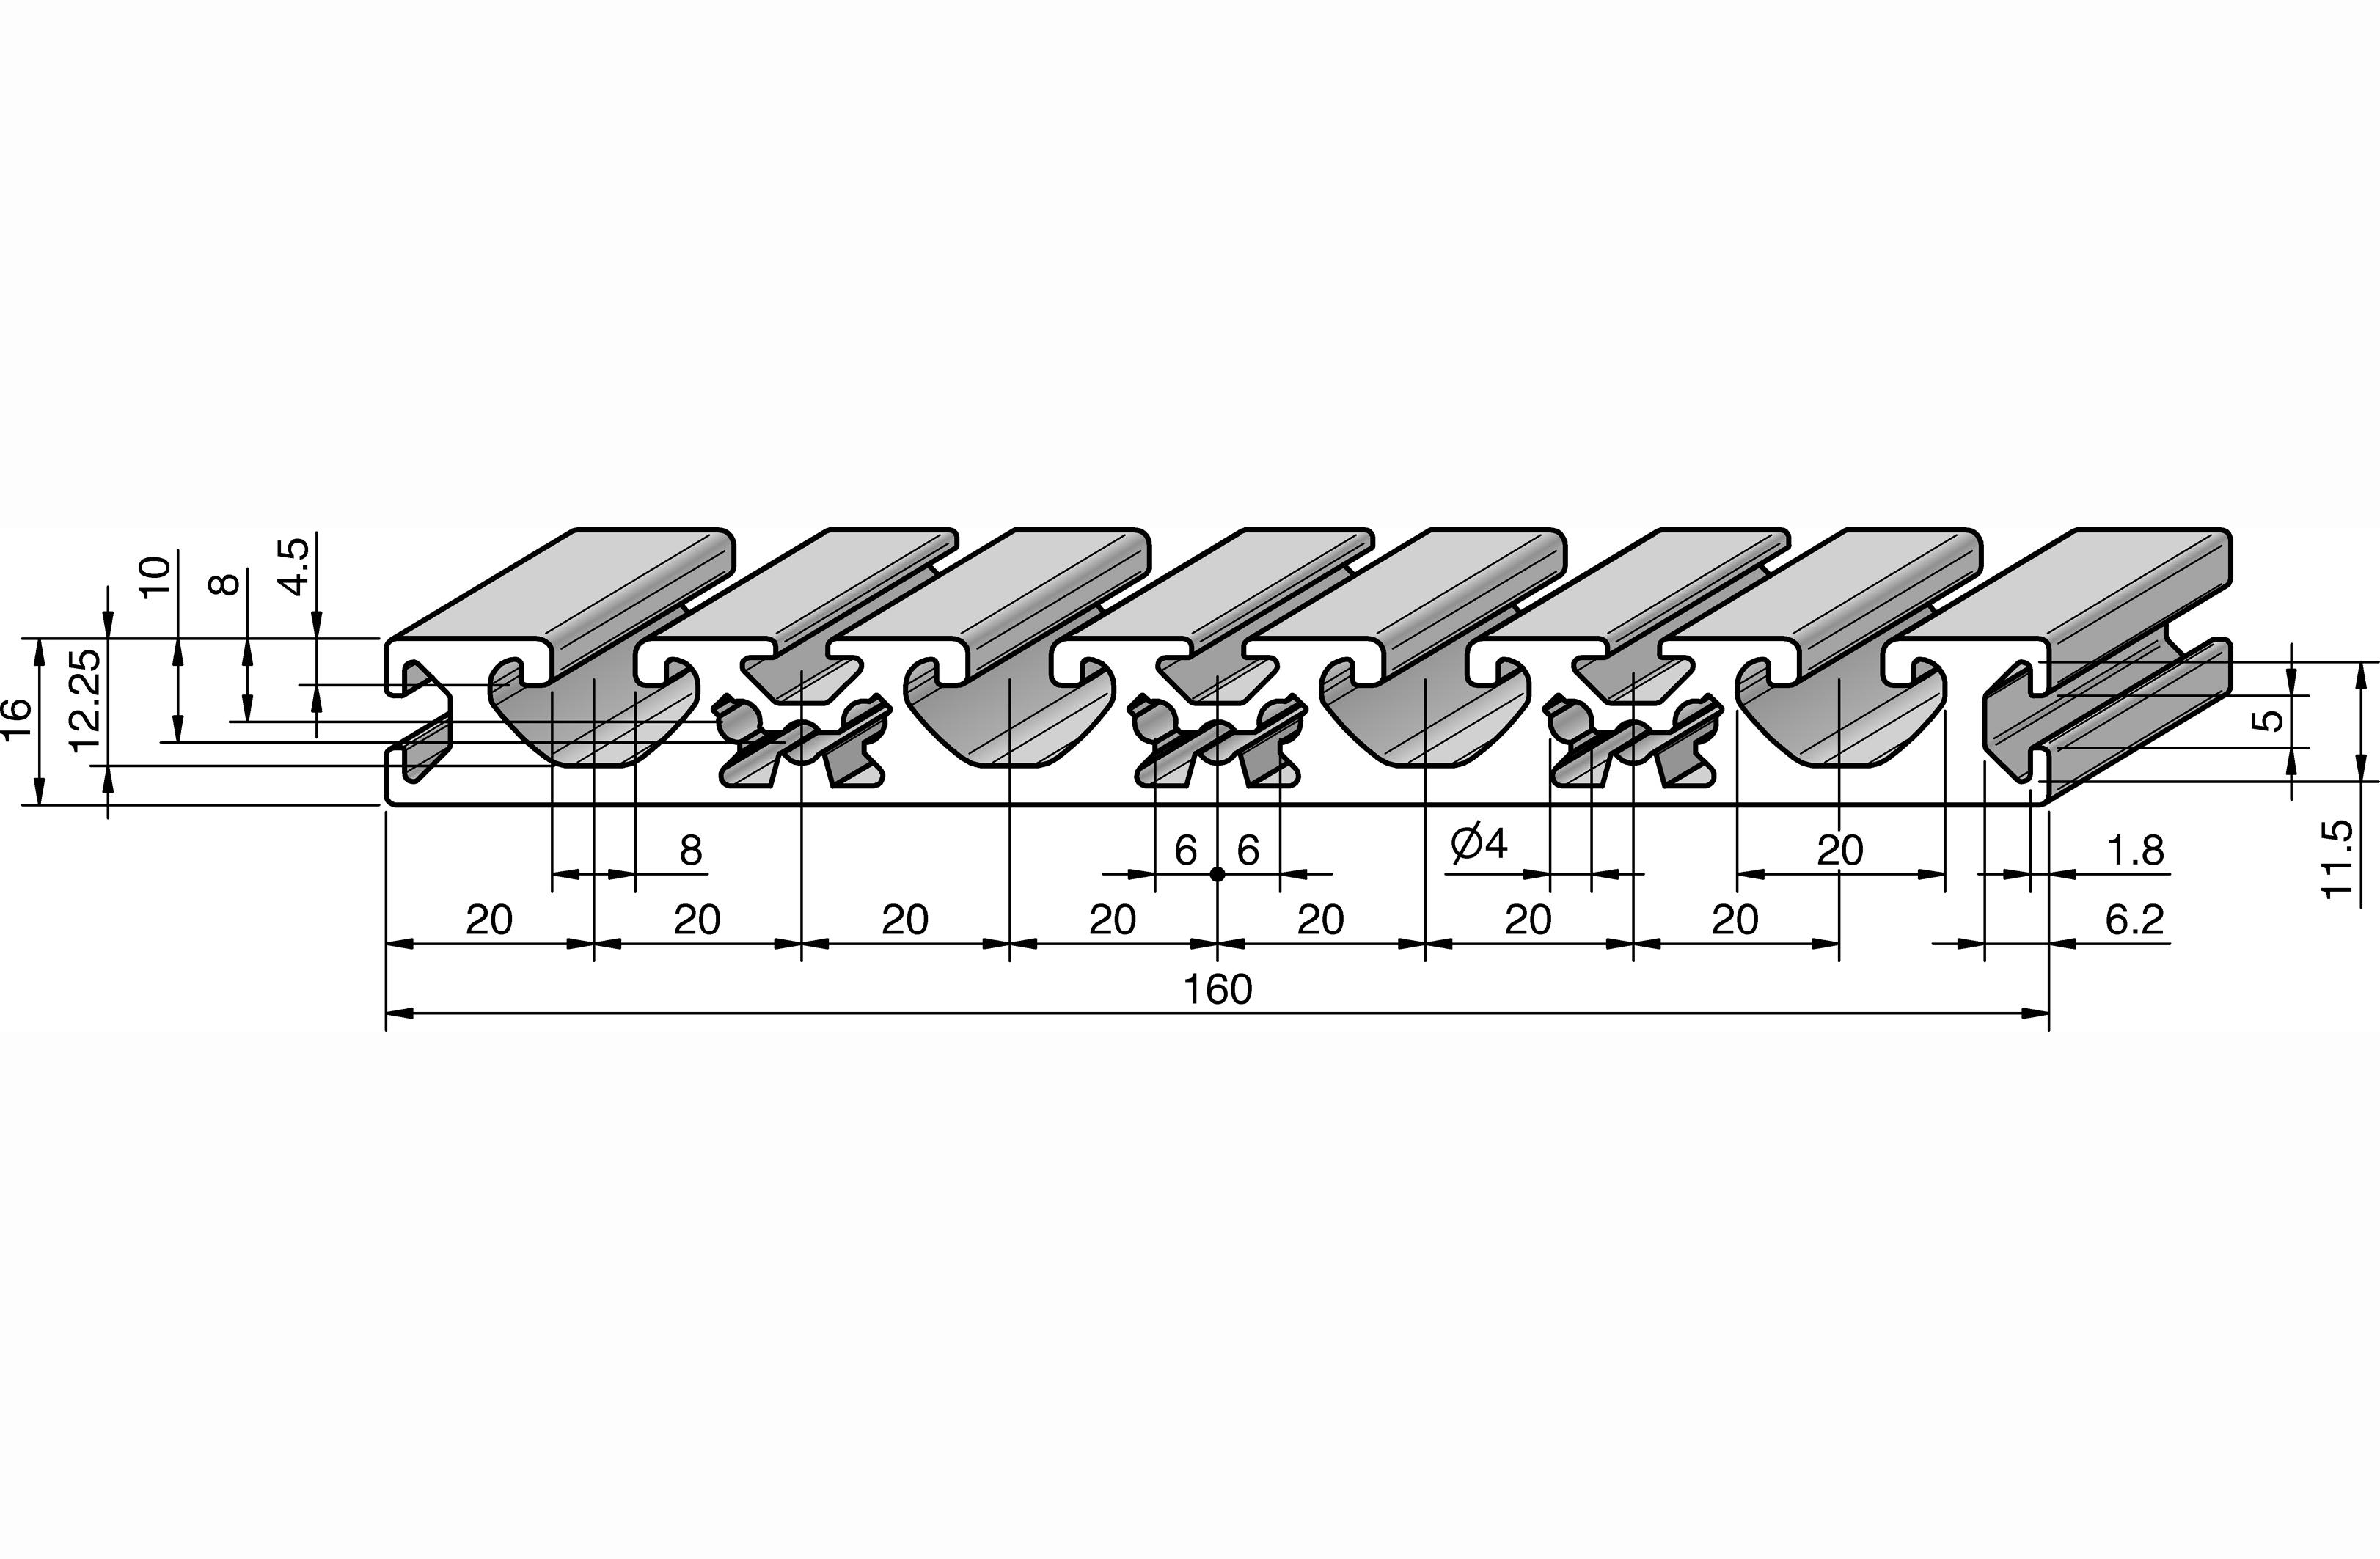 profil 160x16 alv ris pro le systems. Black Bedroom Furniture Sets. Home Design Ideas